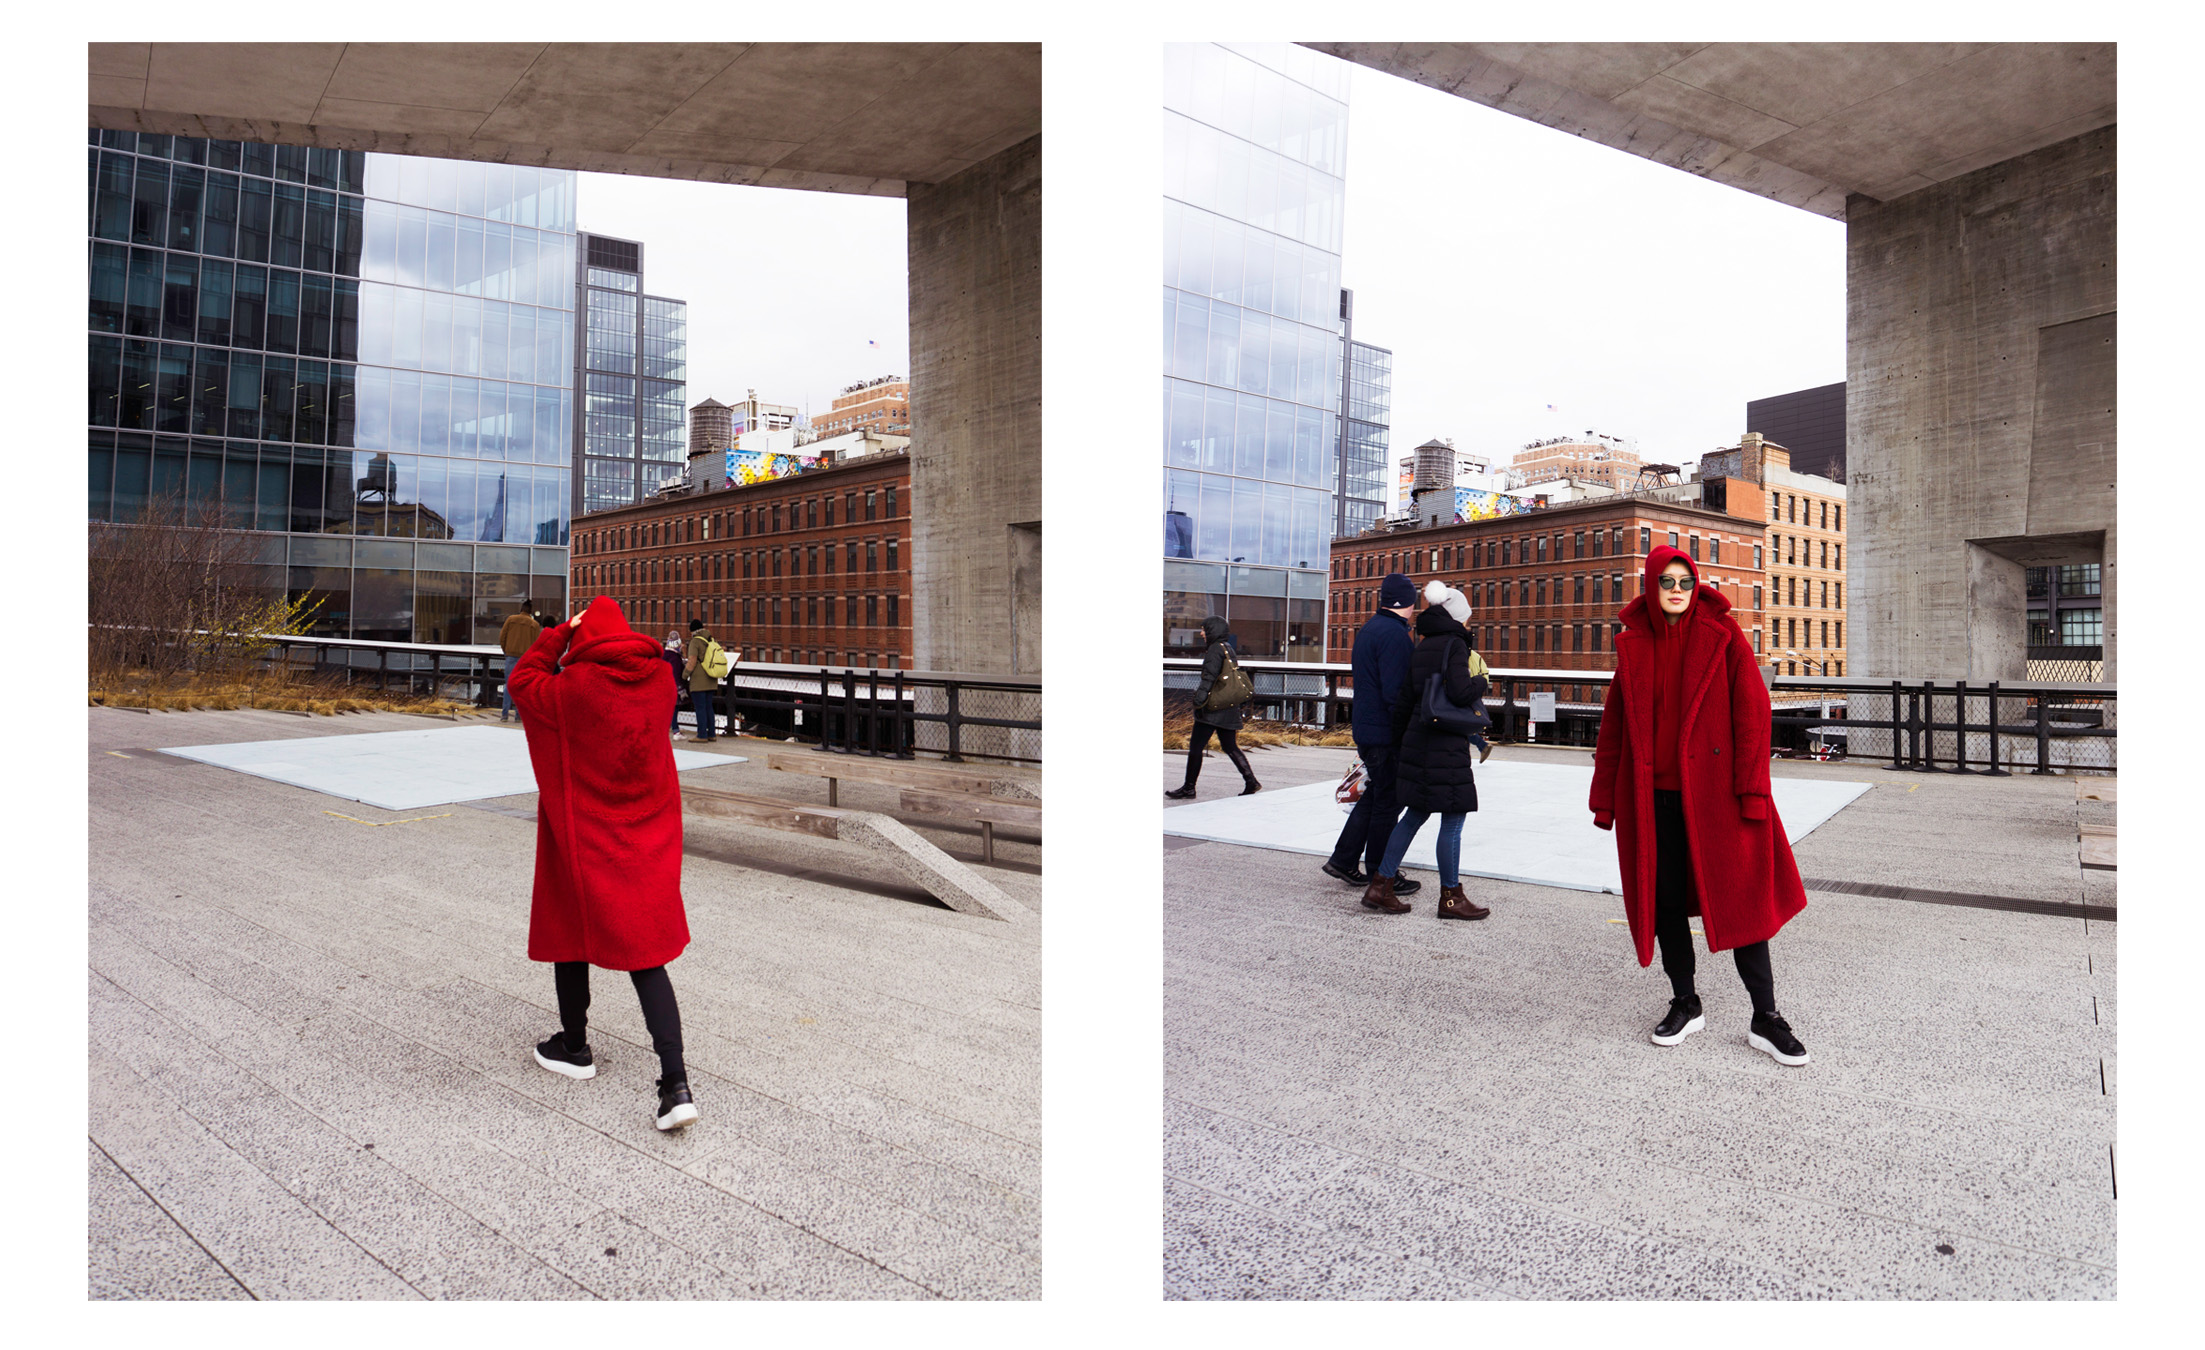 Mandkhai wears MANDKHAI AW18/19 hoodie in red and Maxmara coat.